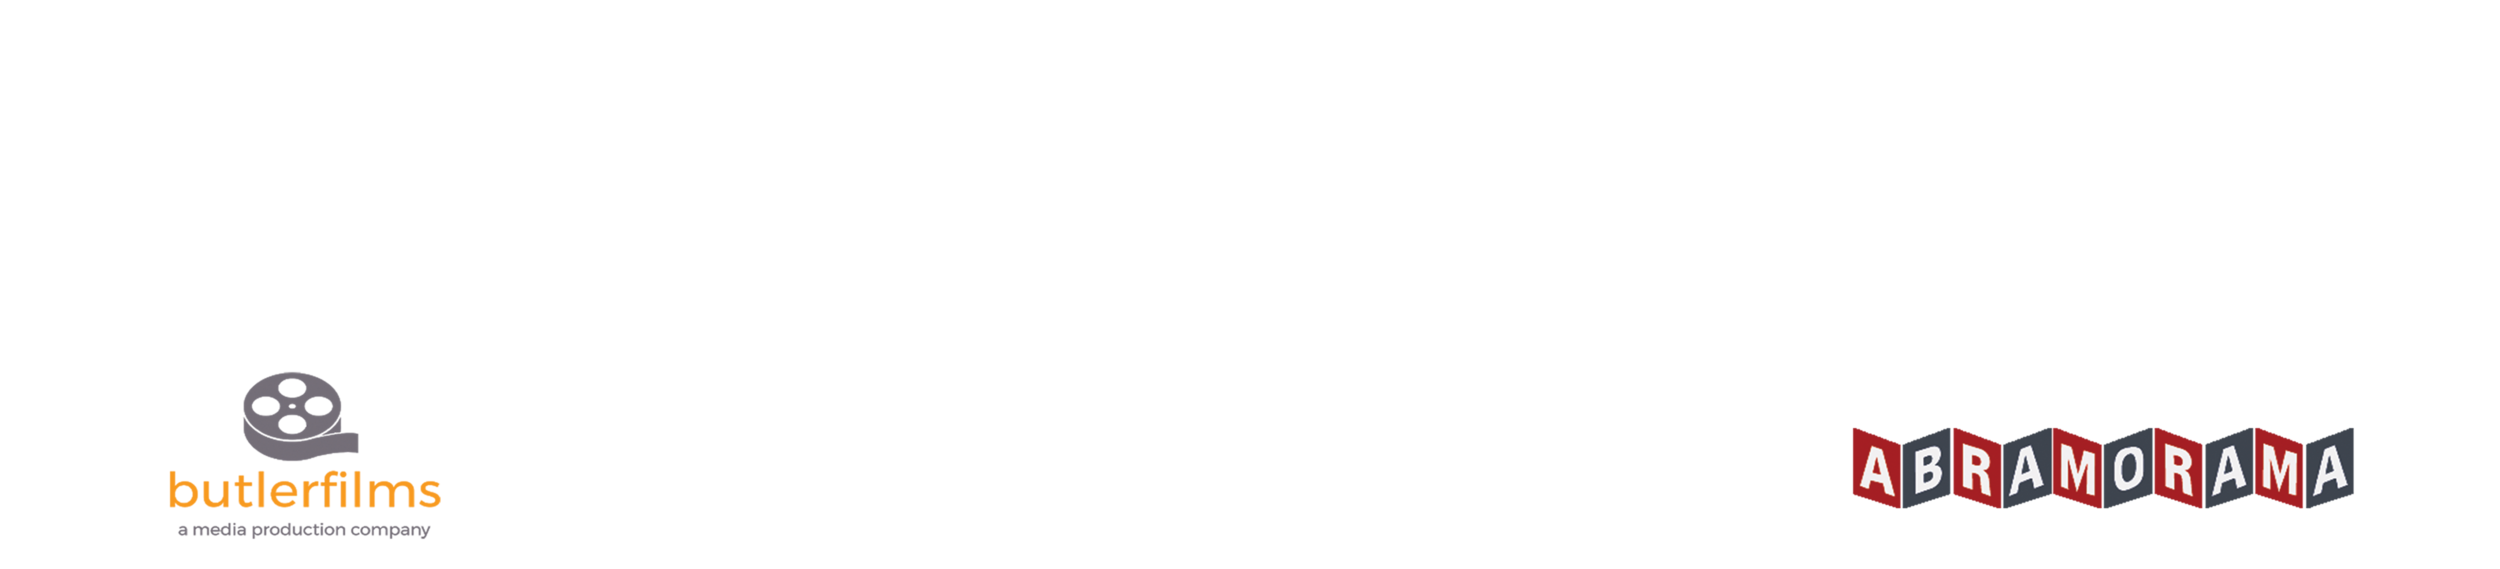 American Heretics The Politics Of The Gospel